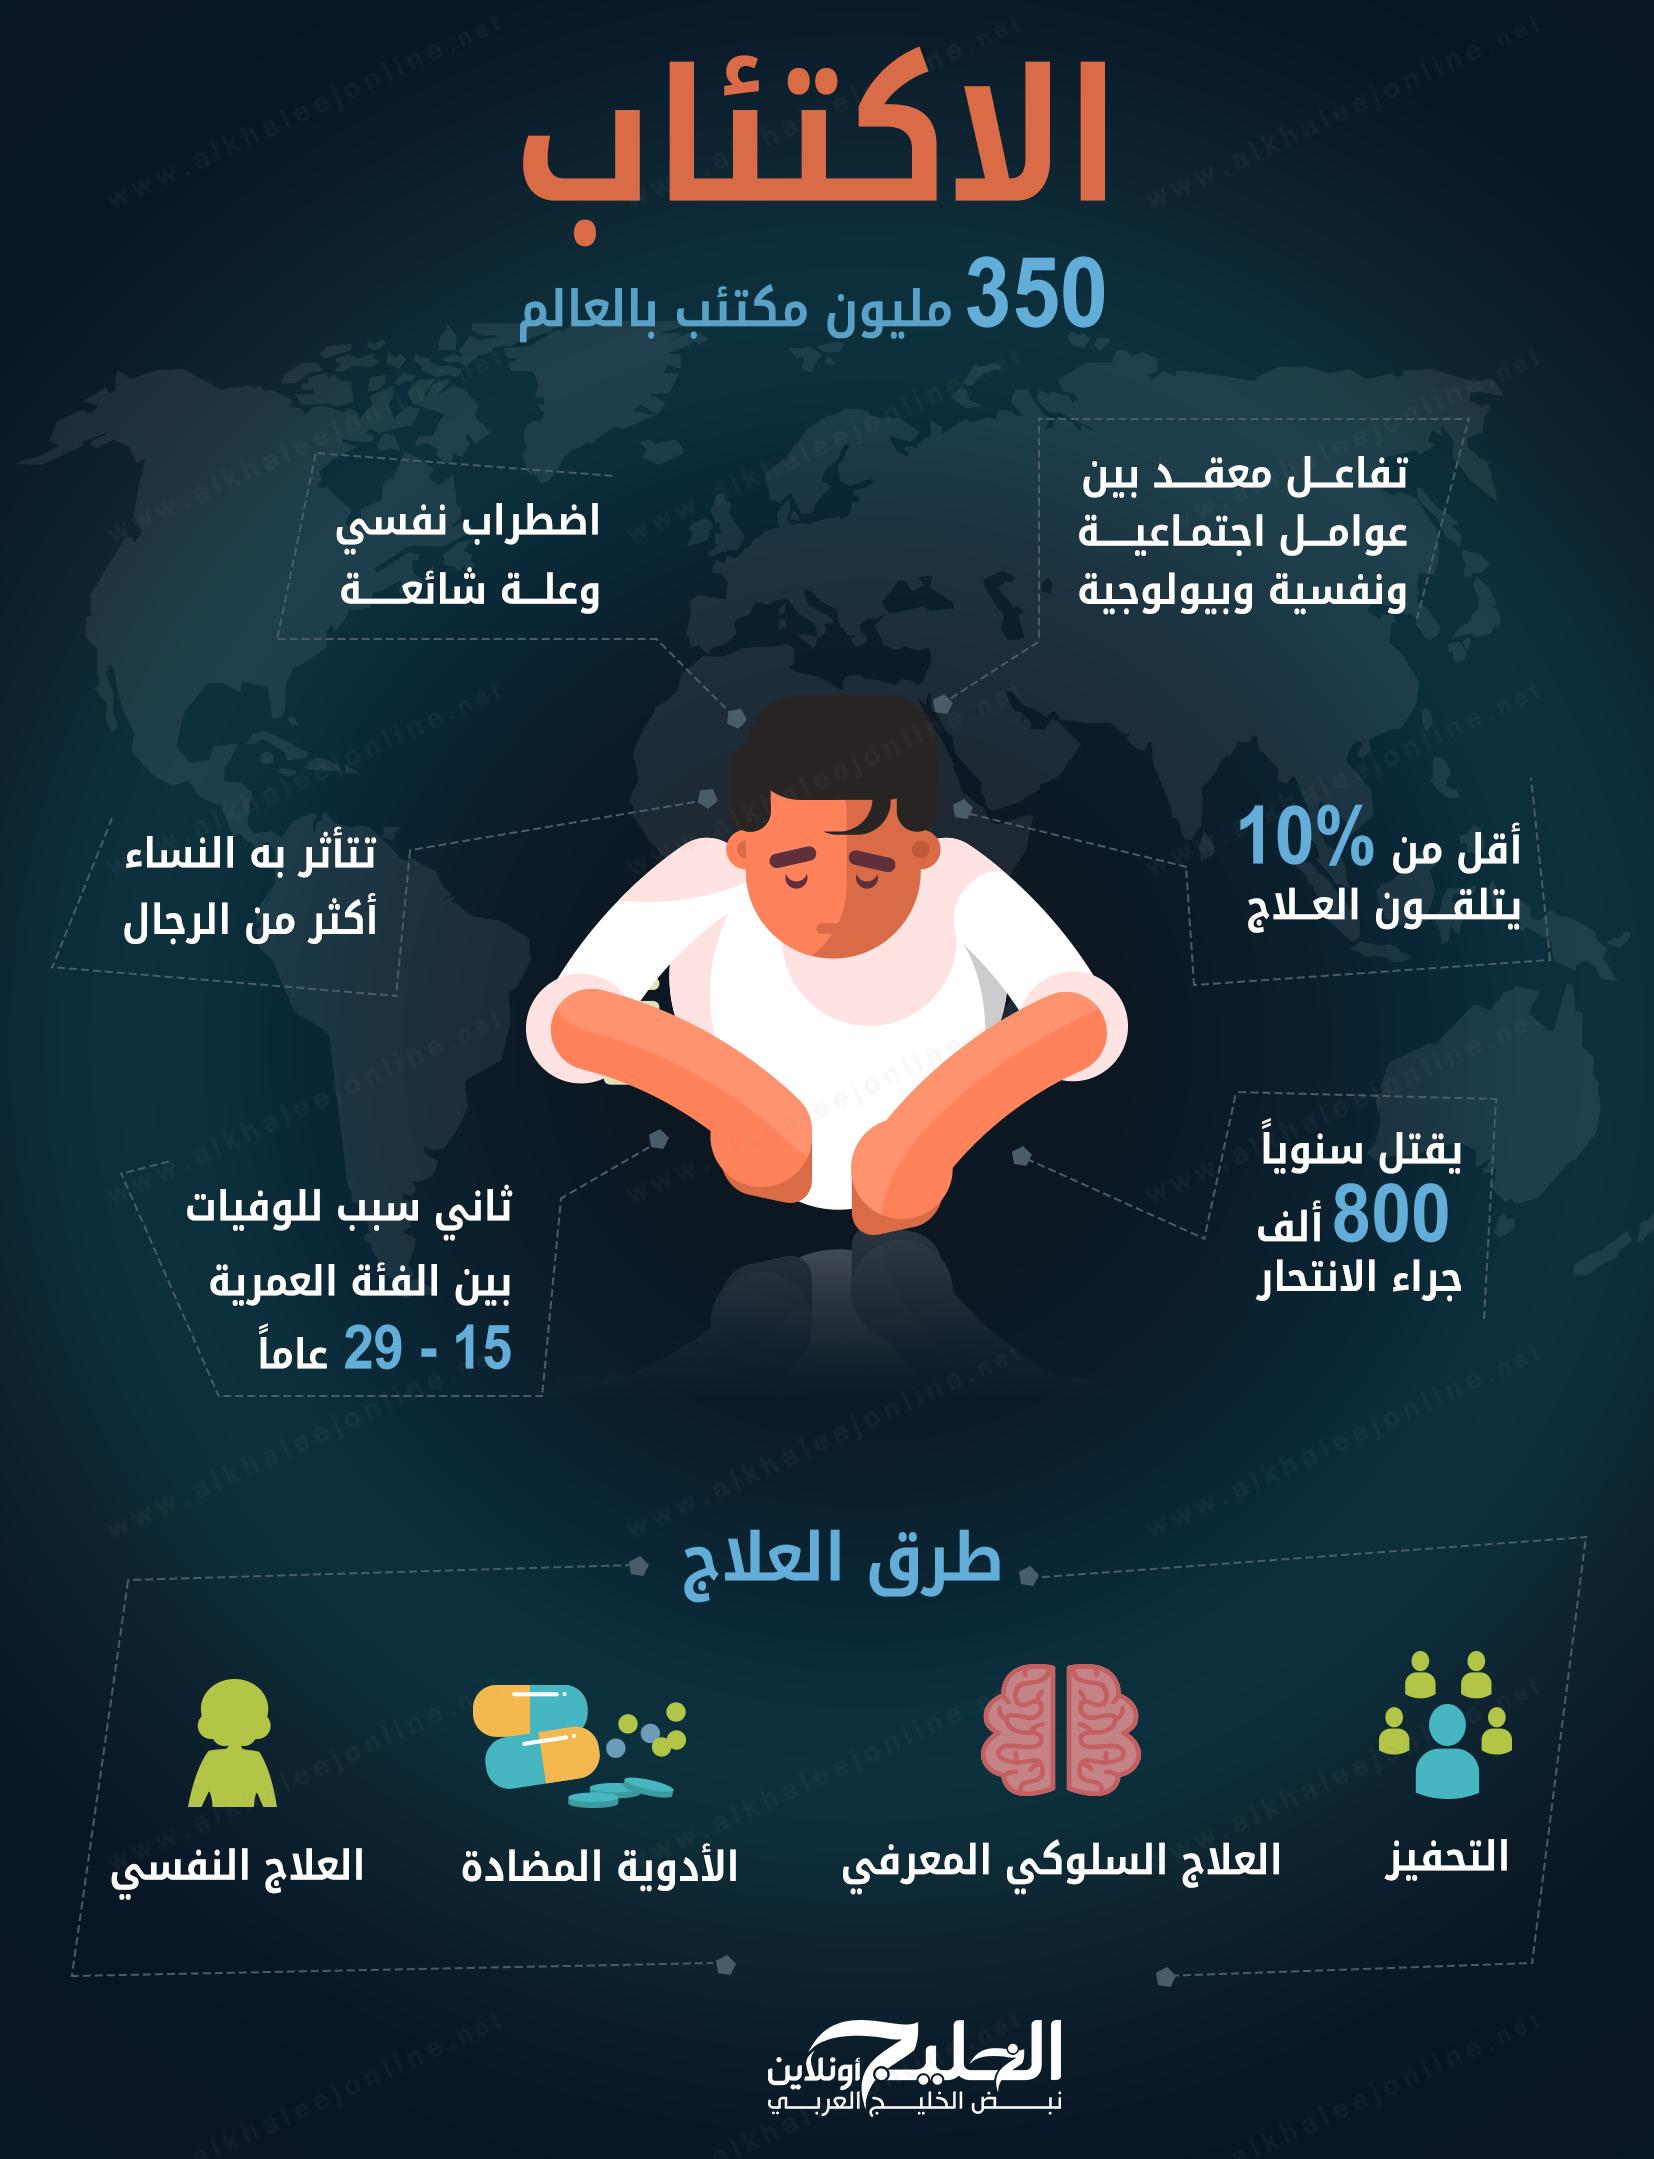 صور اسباب الاكتئاب , اعراض مرض الاكتئاب